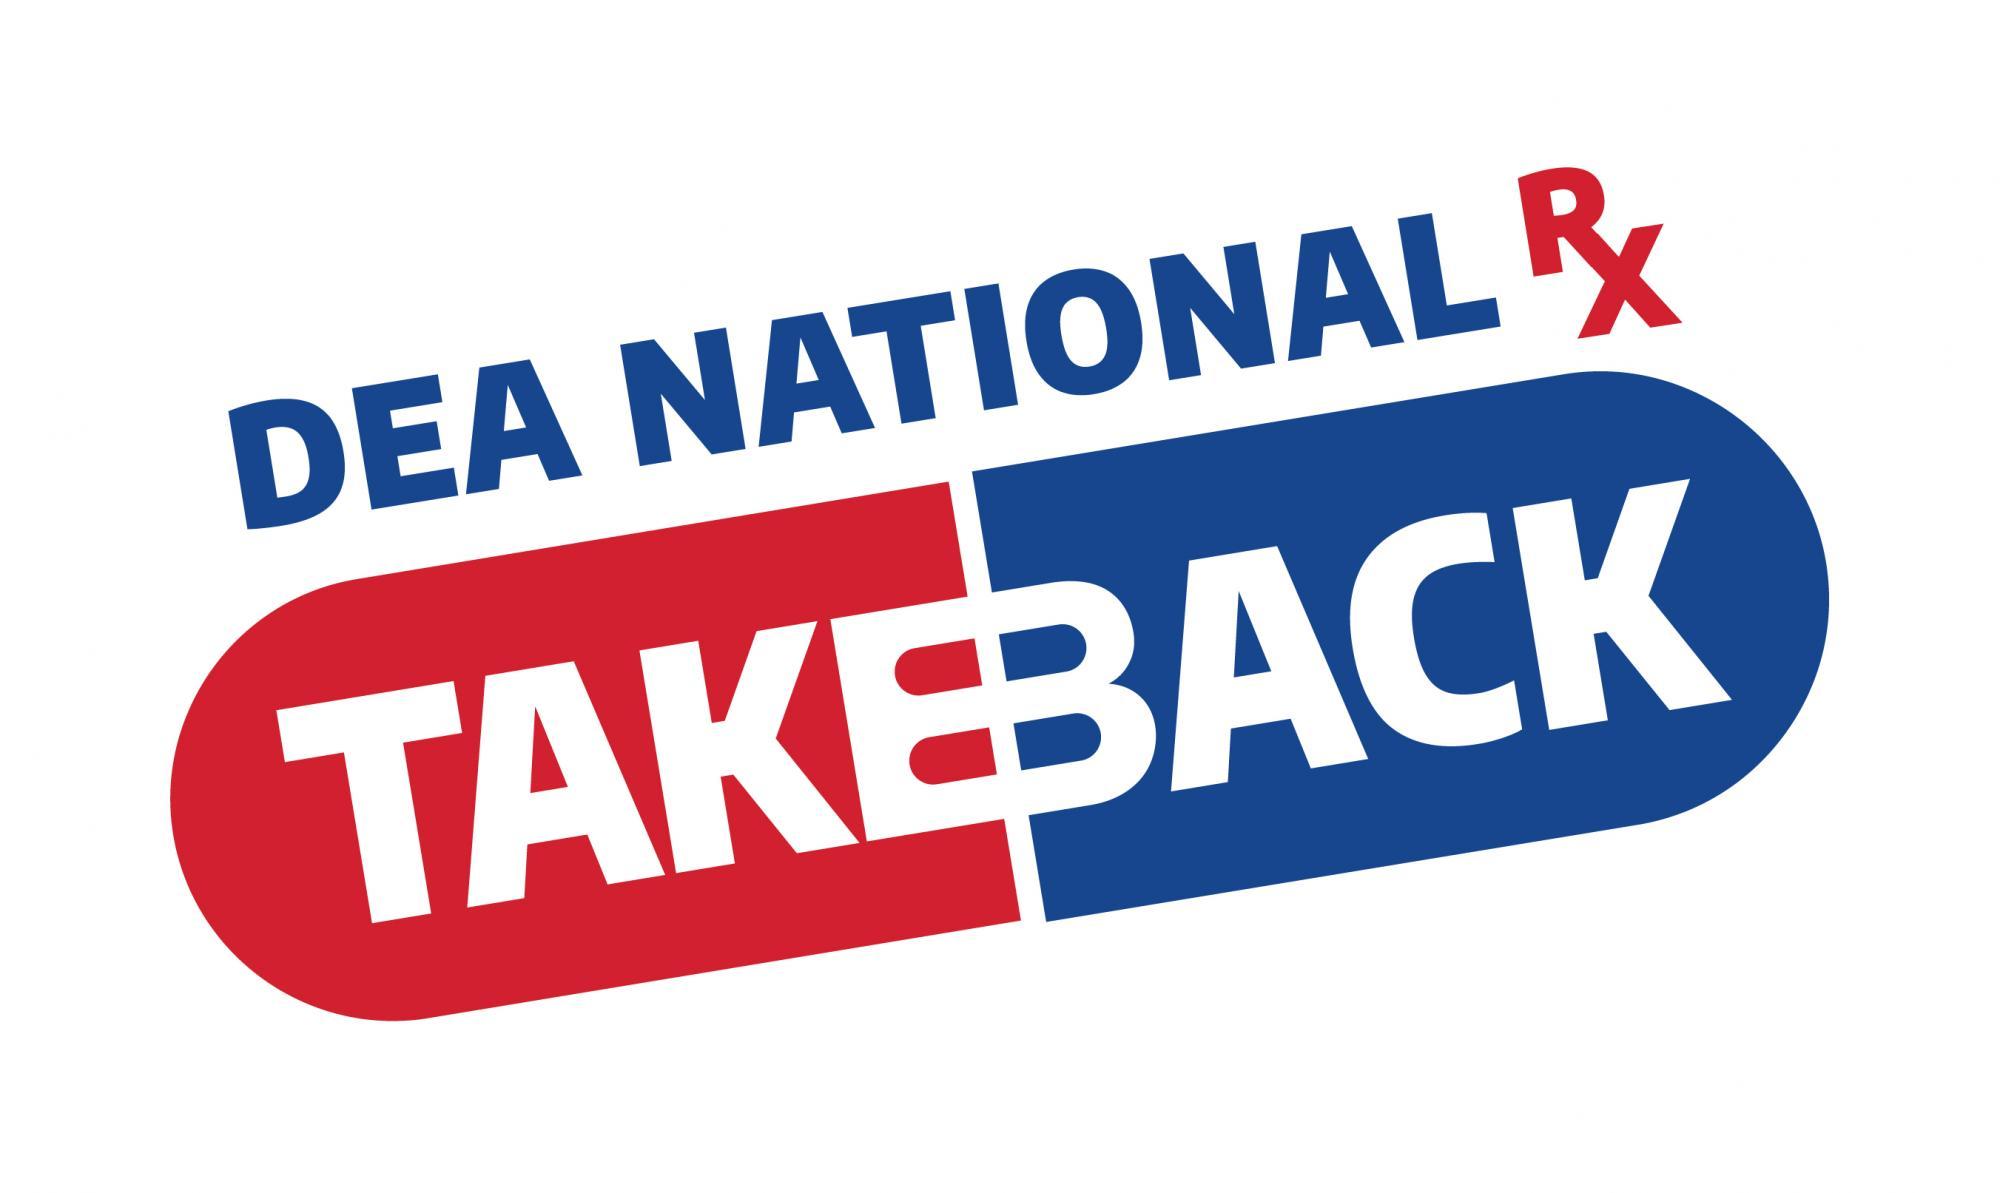 DEA_TakeBackMark_RGB